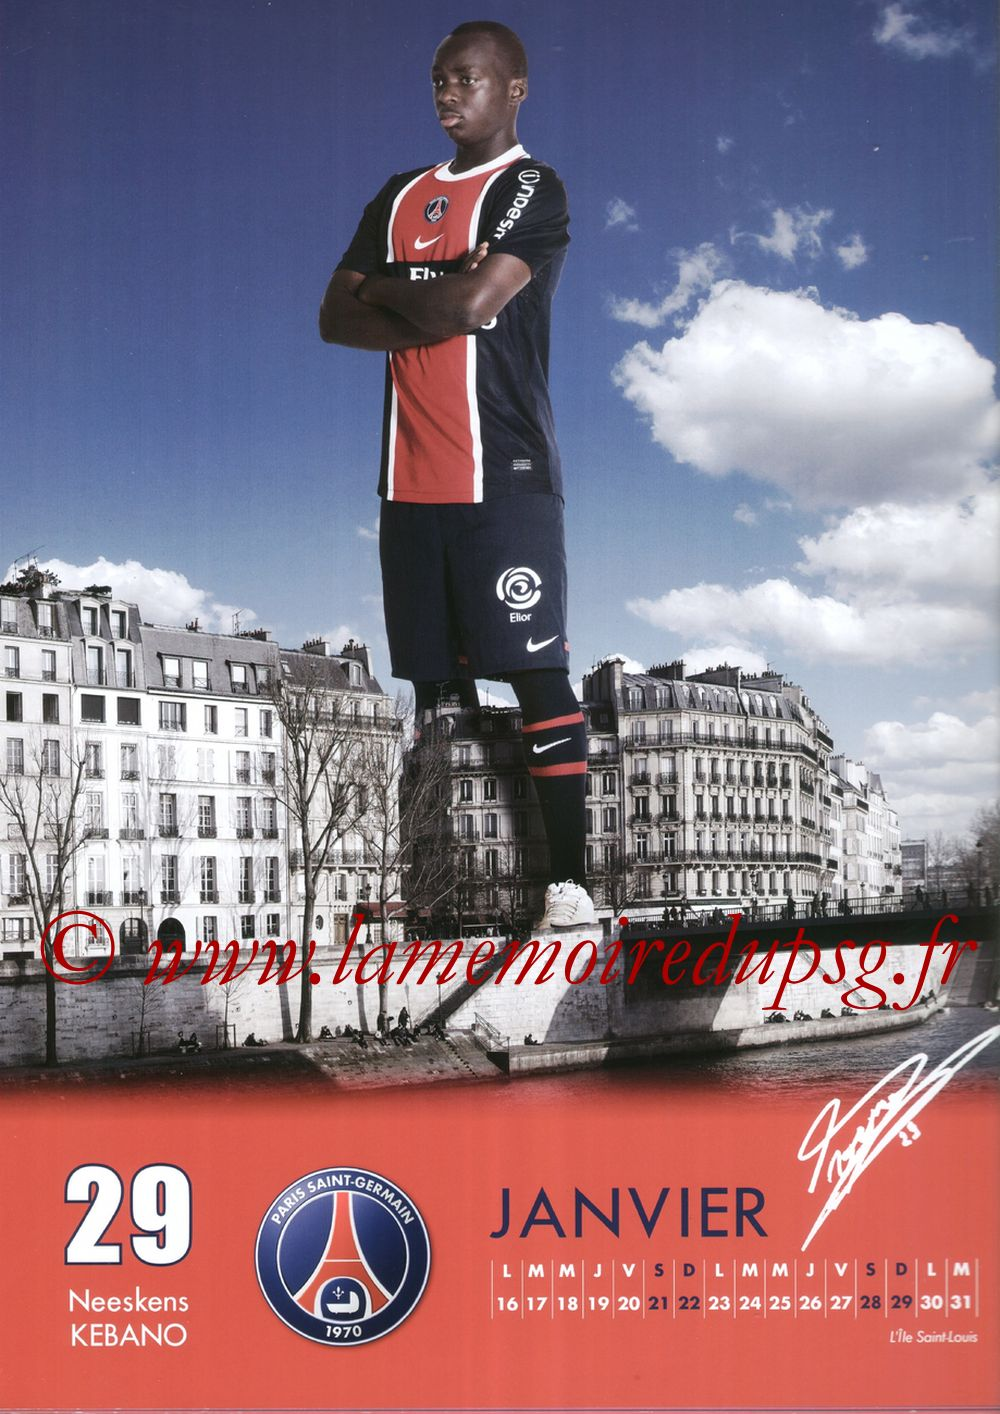 Calendrier PSG 2012 - Page 02 - Neeskens KEBANO